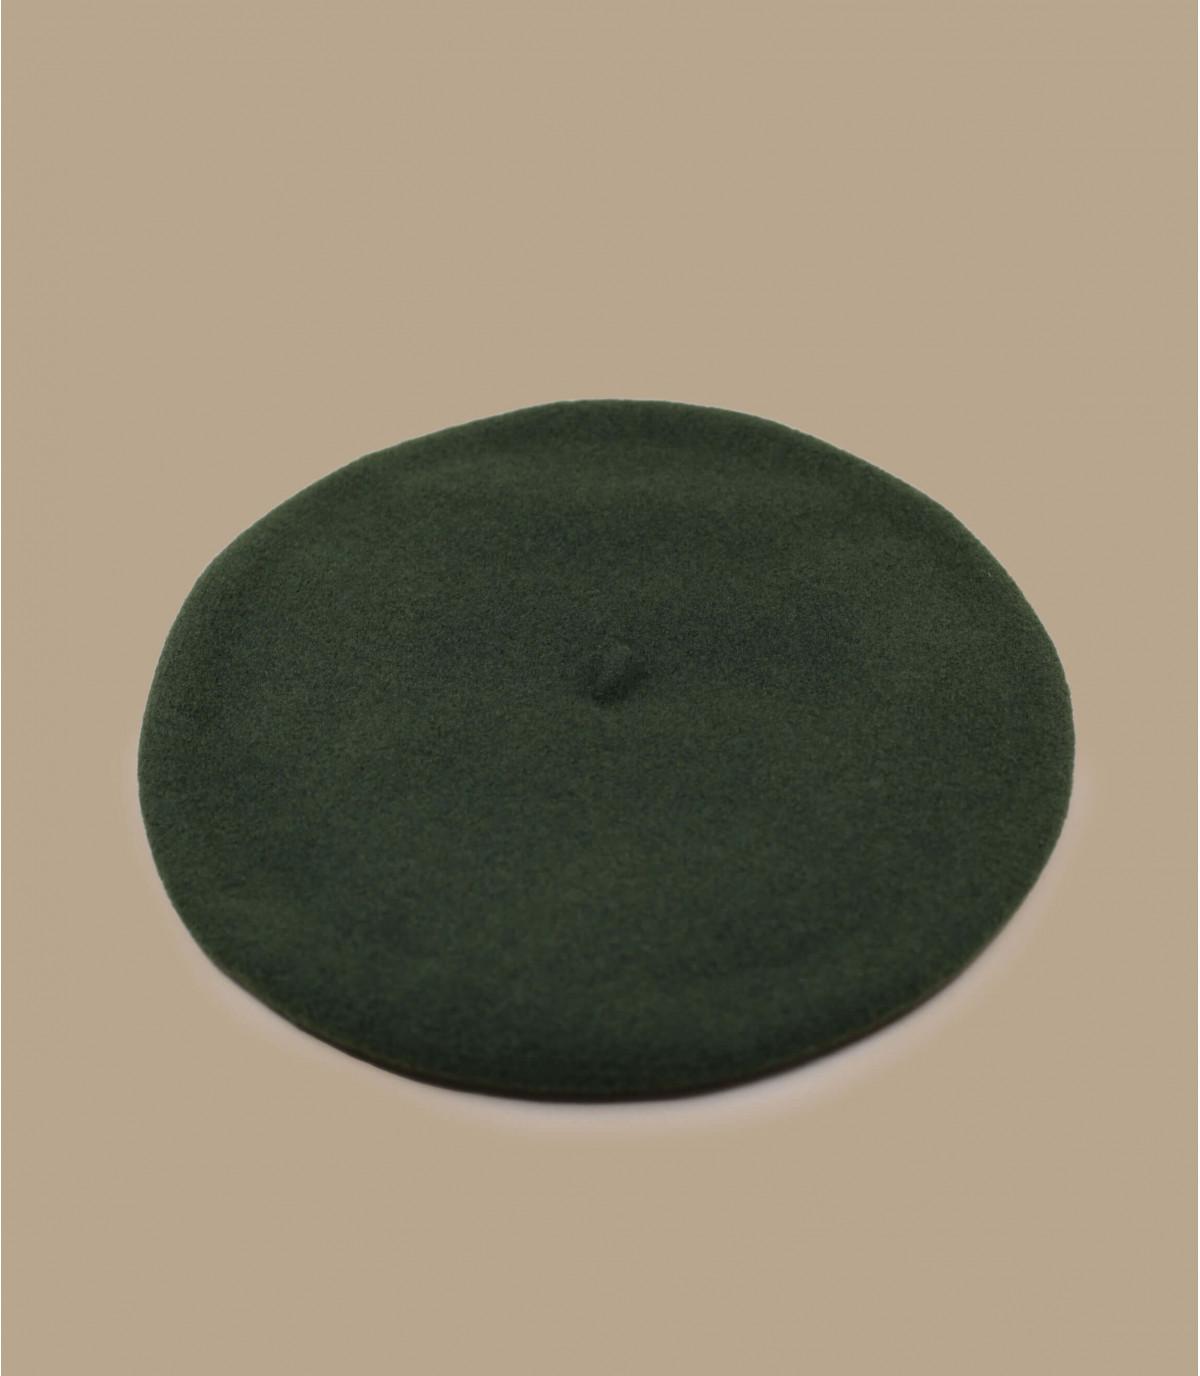 Baskenmütze Wolle gefüttert grün